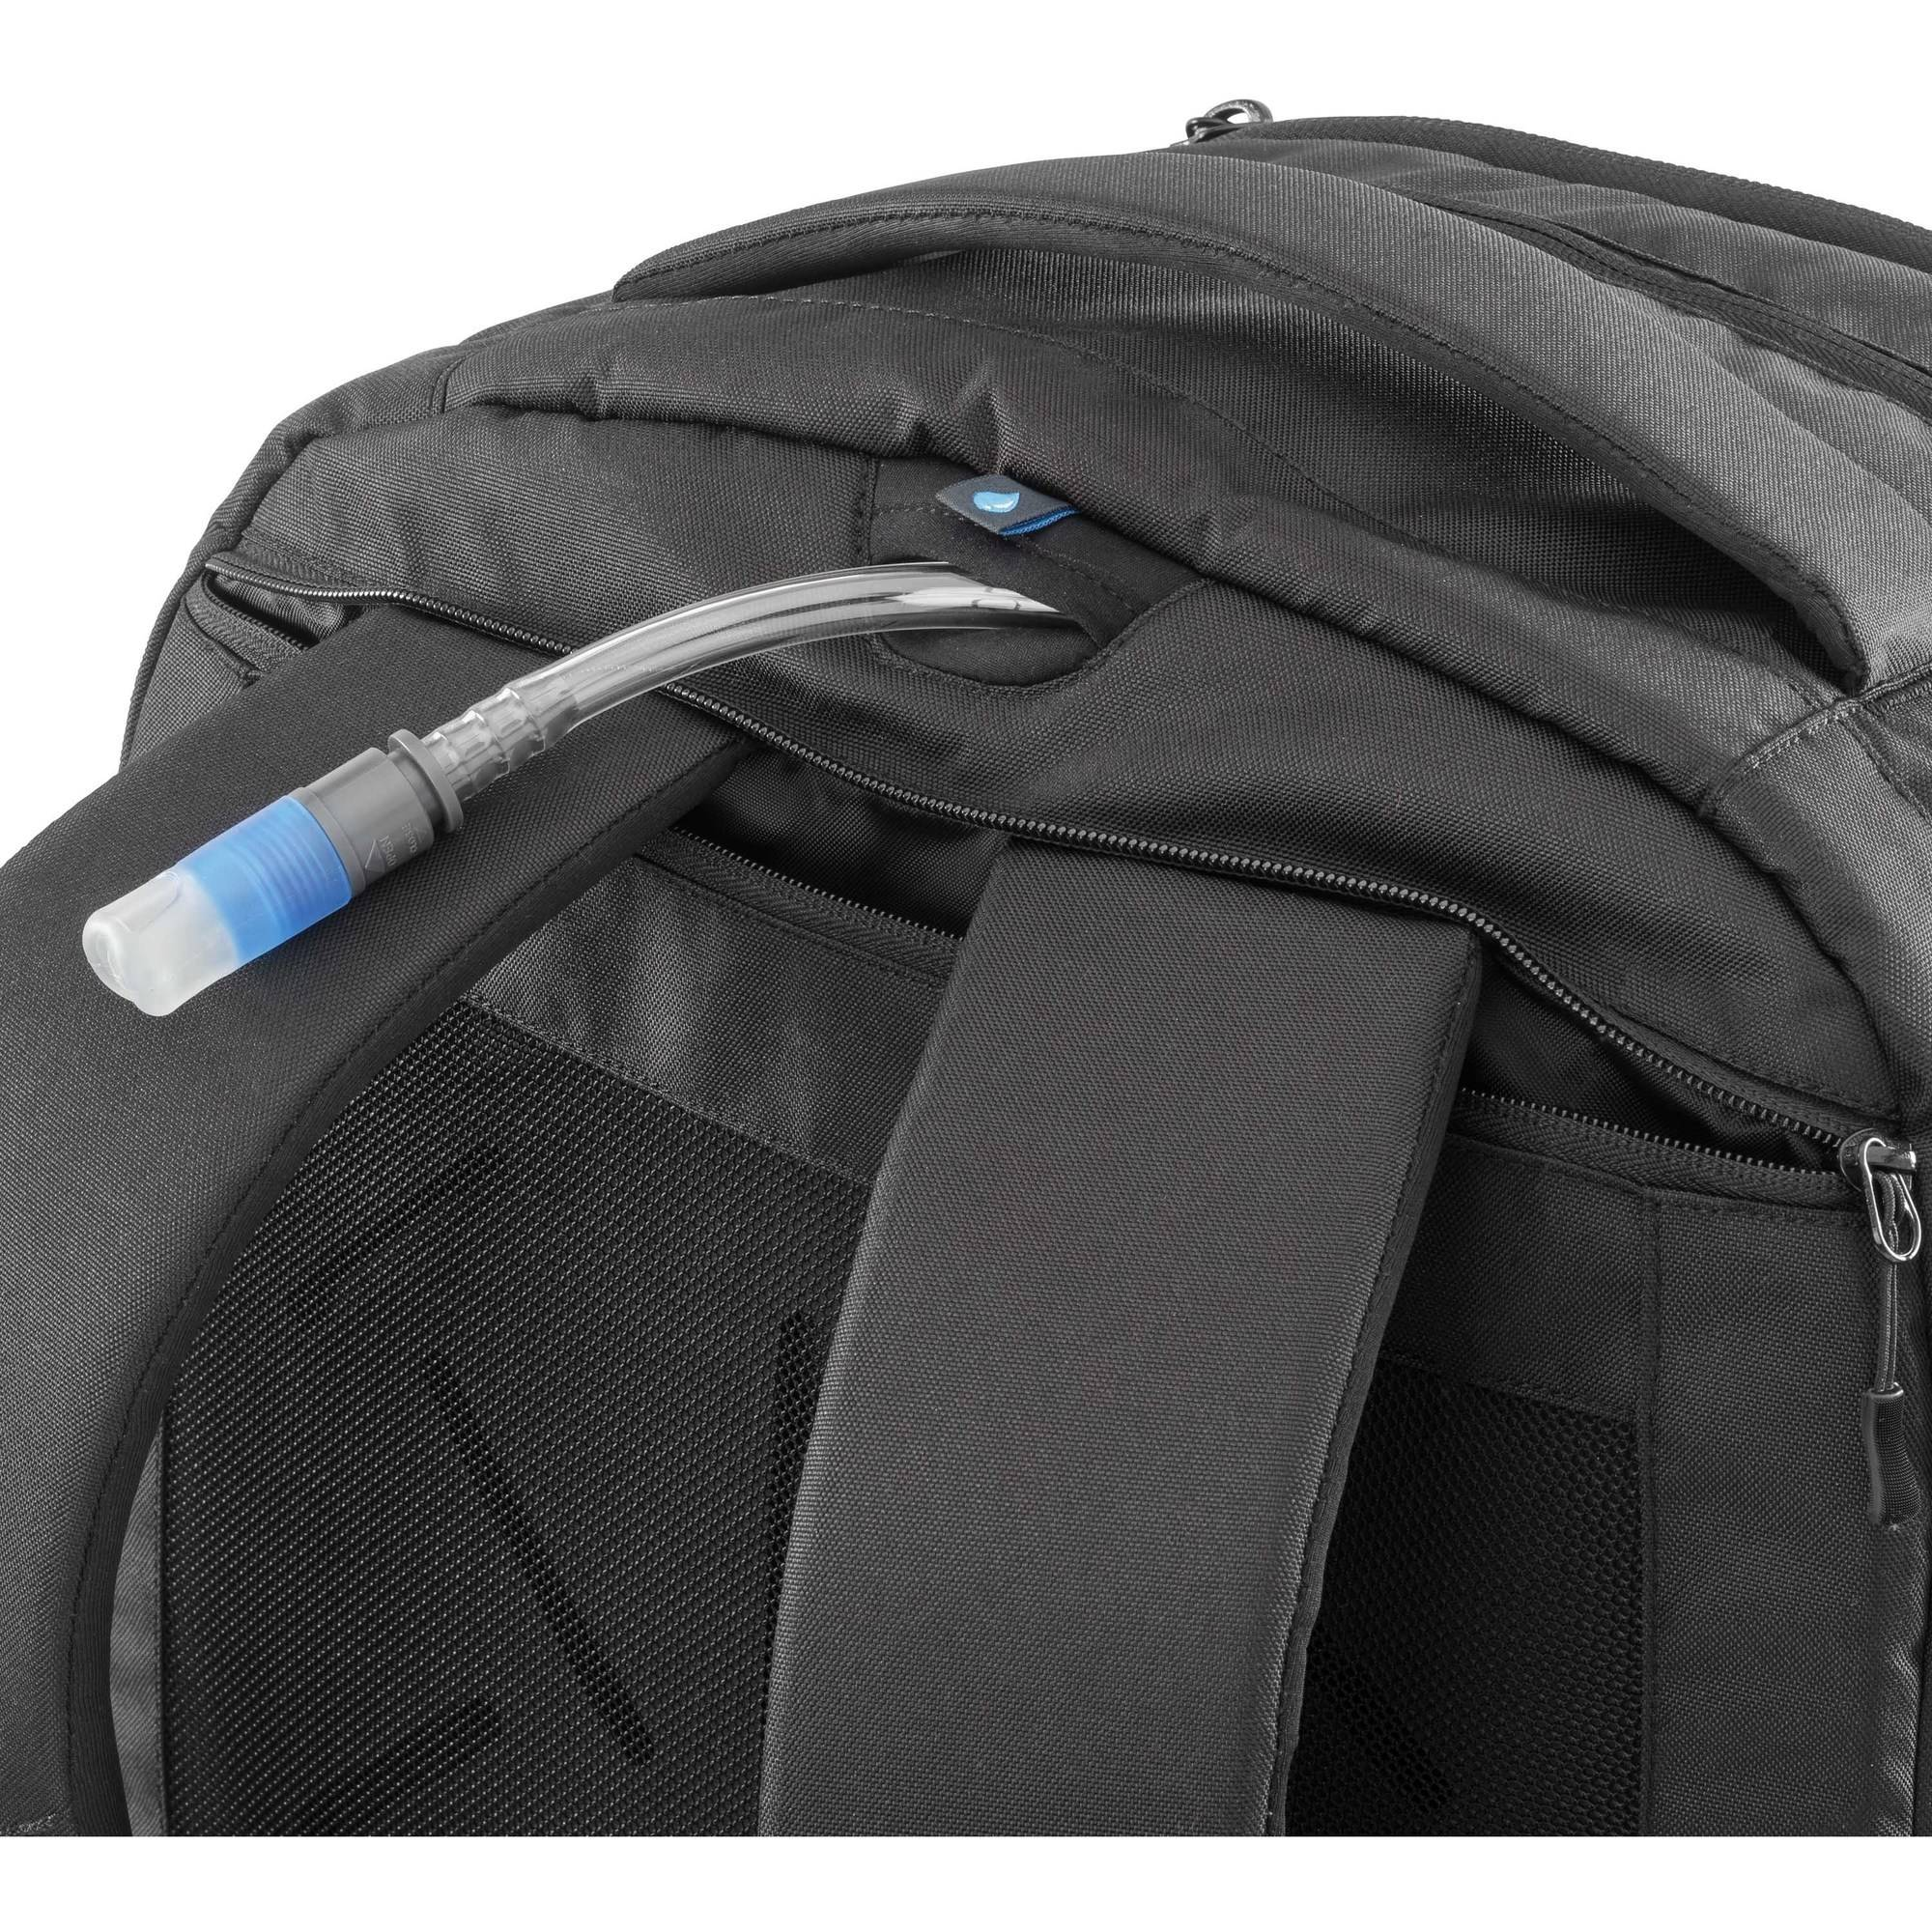 115e71f35 Ozark Trail Large Traveler Backpack - Walmart.com